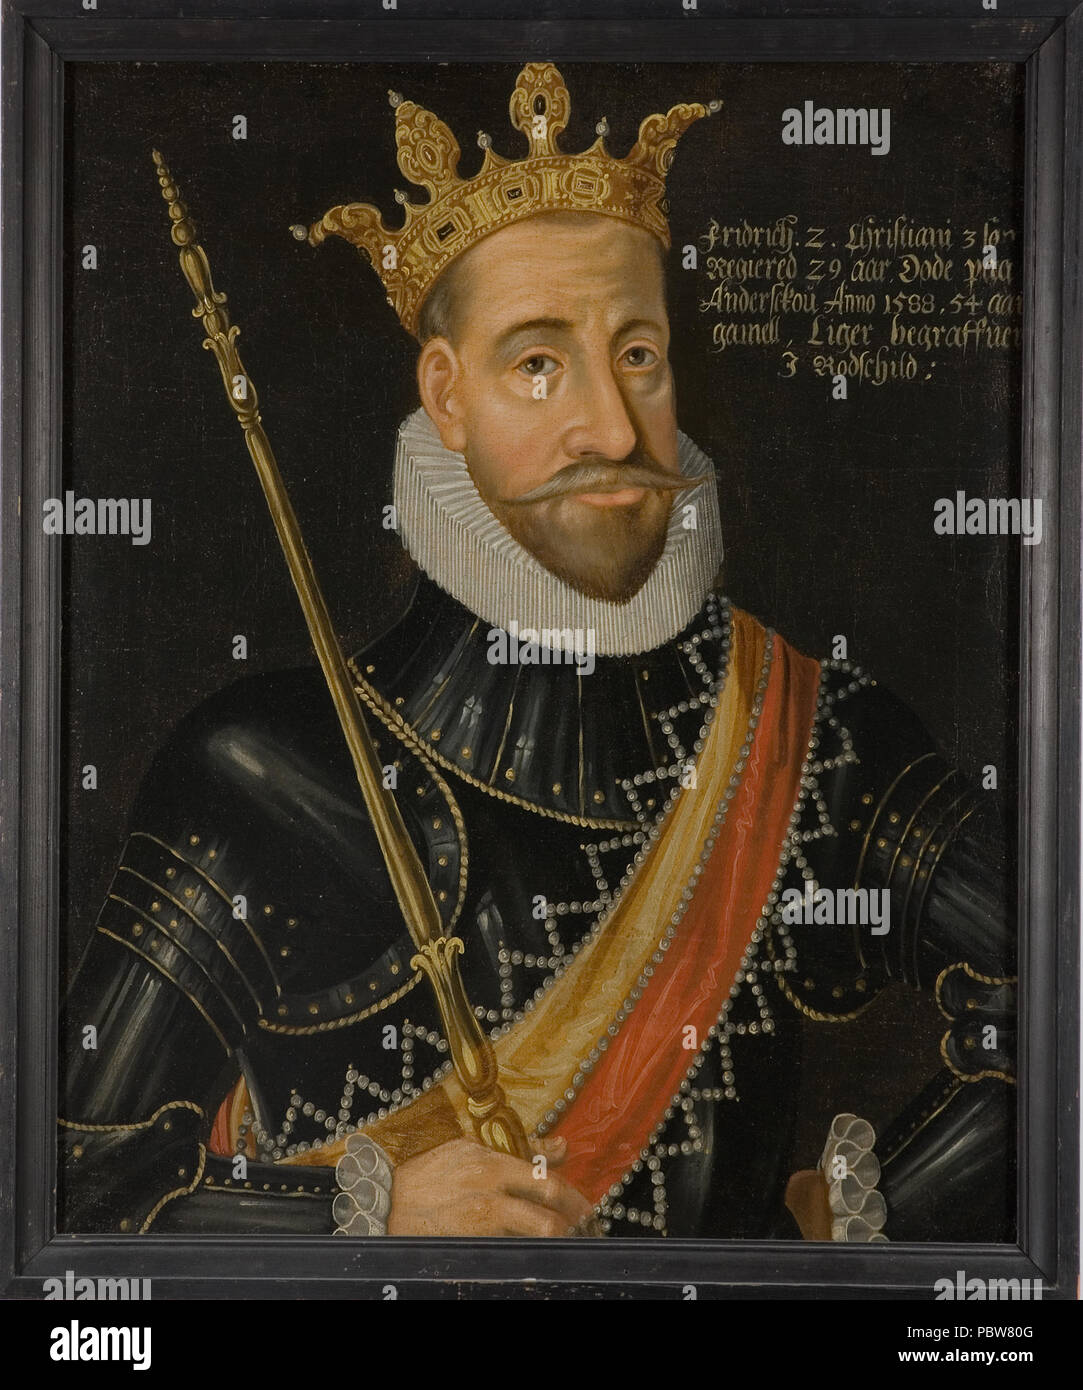 21 Fredrik II, 1534-88, konung av Danmark och Norge - Nationalmuseum - 14757  Stock Photo - Alamy